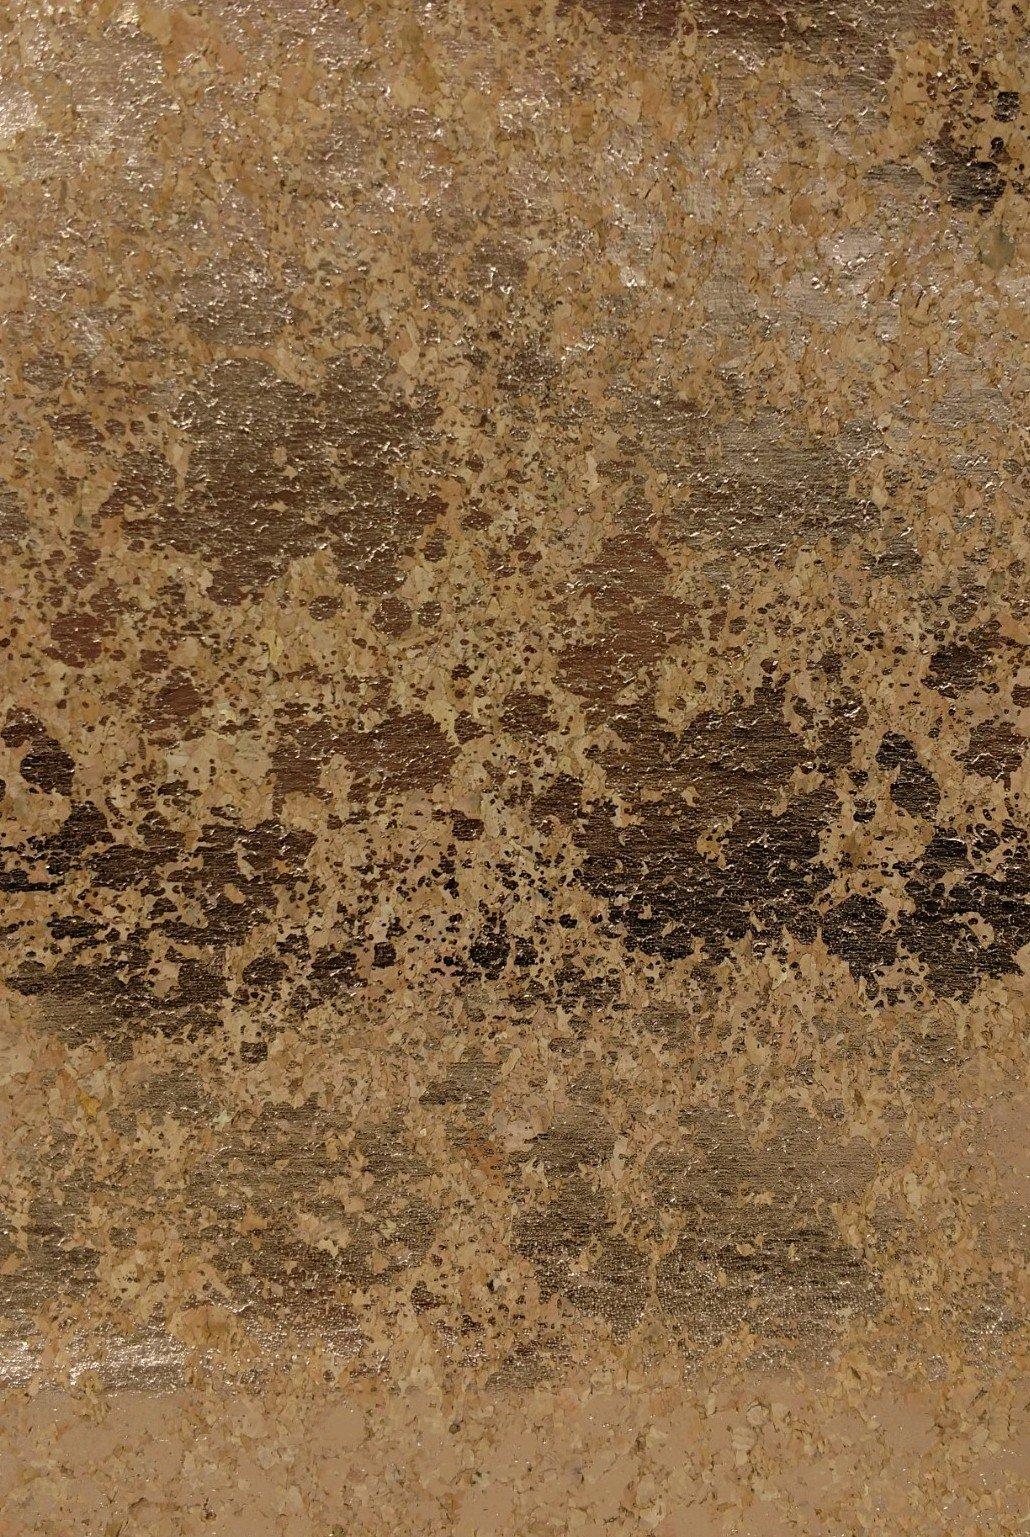 *EOB* Cork Fabric Copper Metallic B54C-90-810 - 0.85 YD